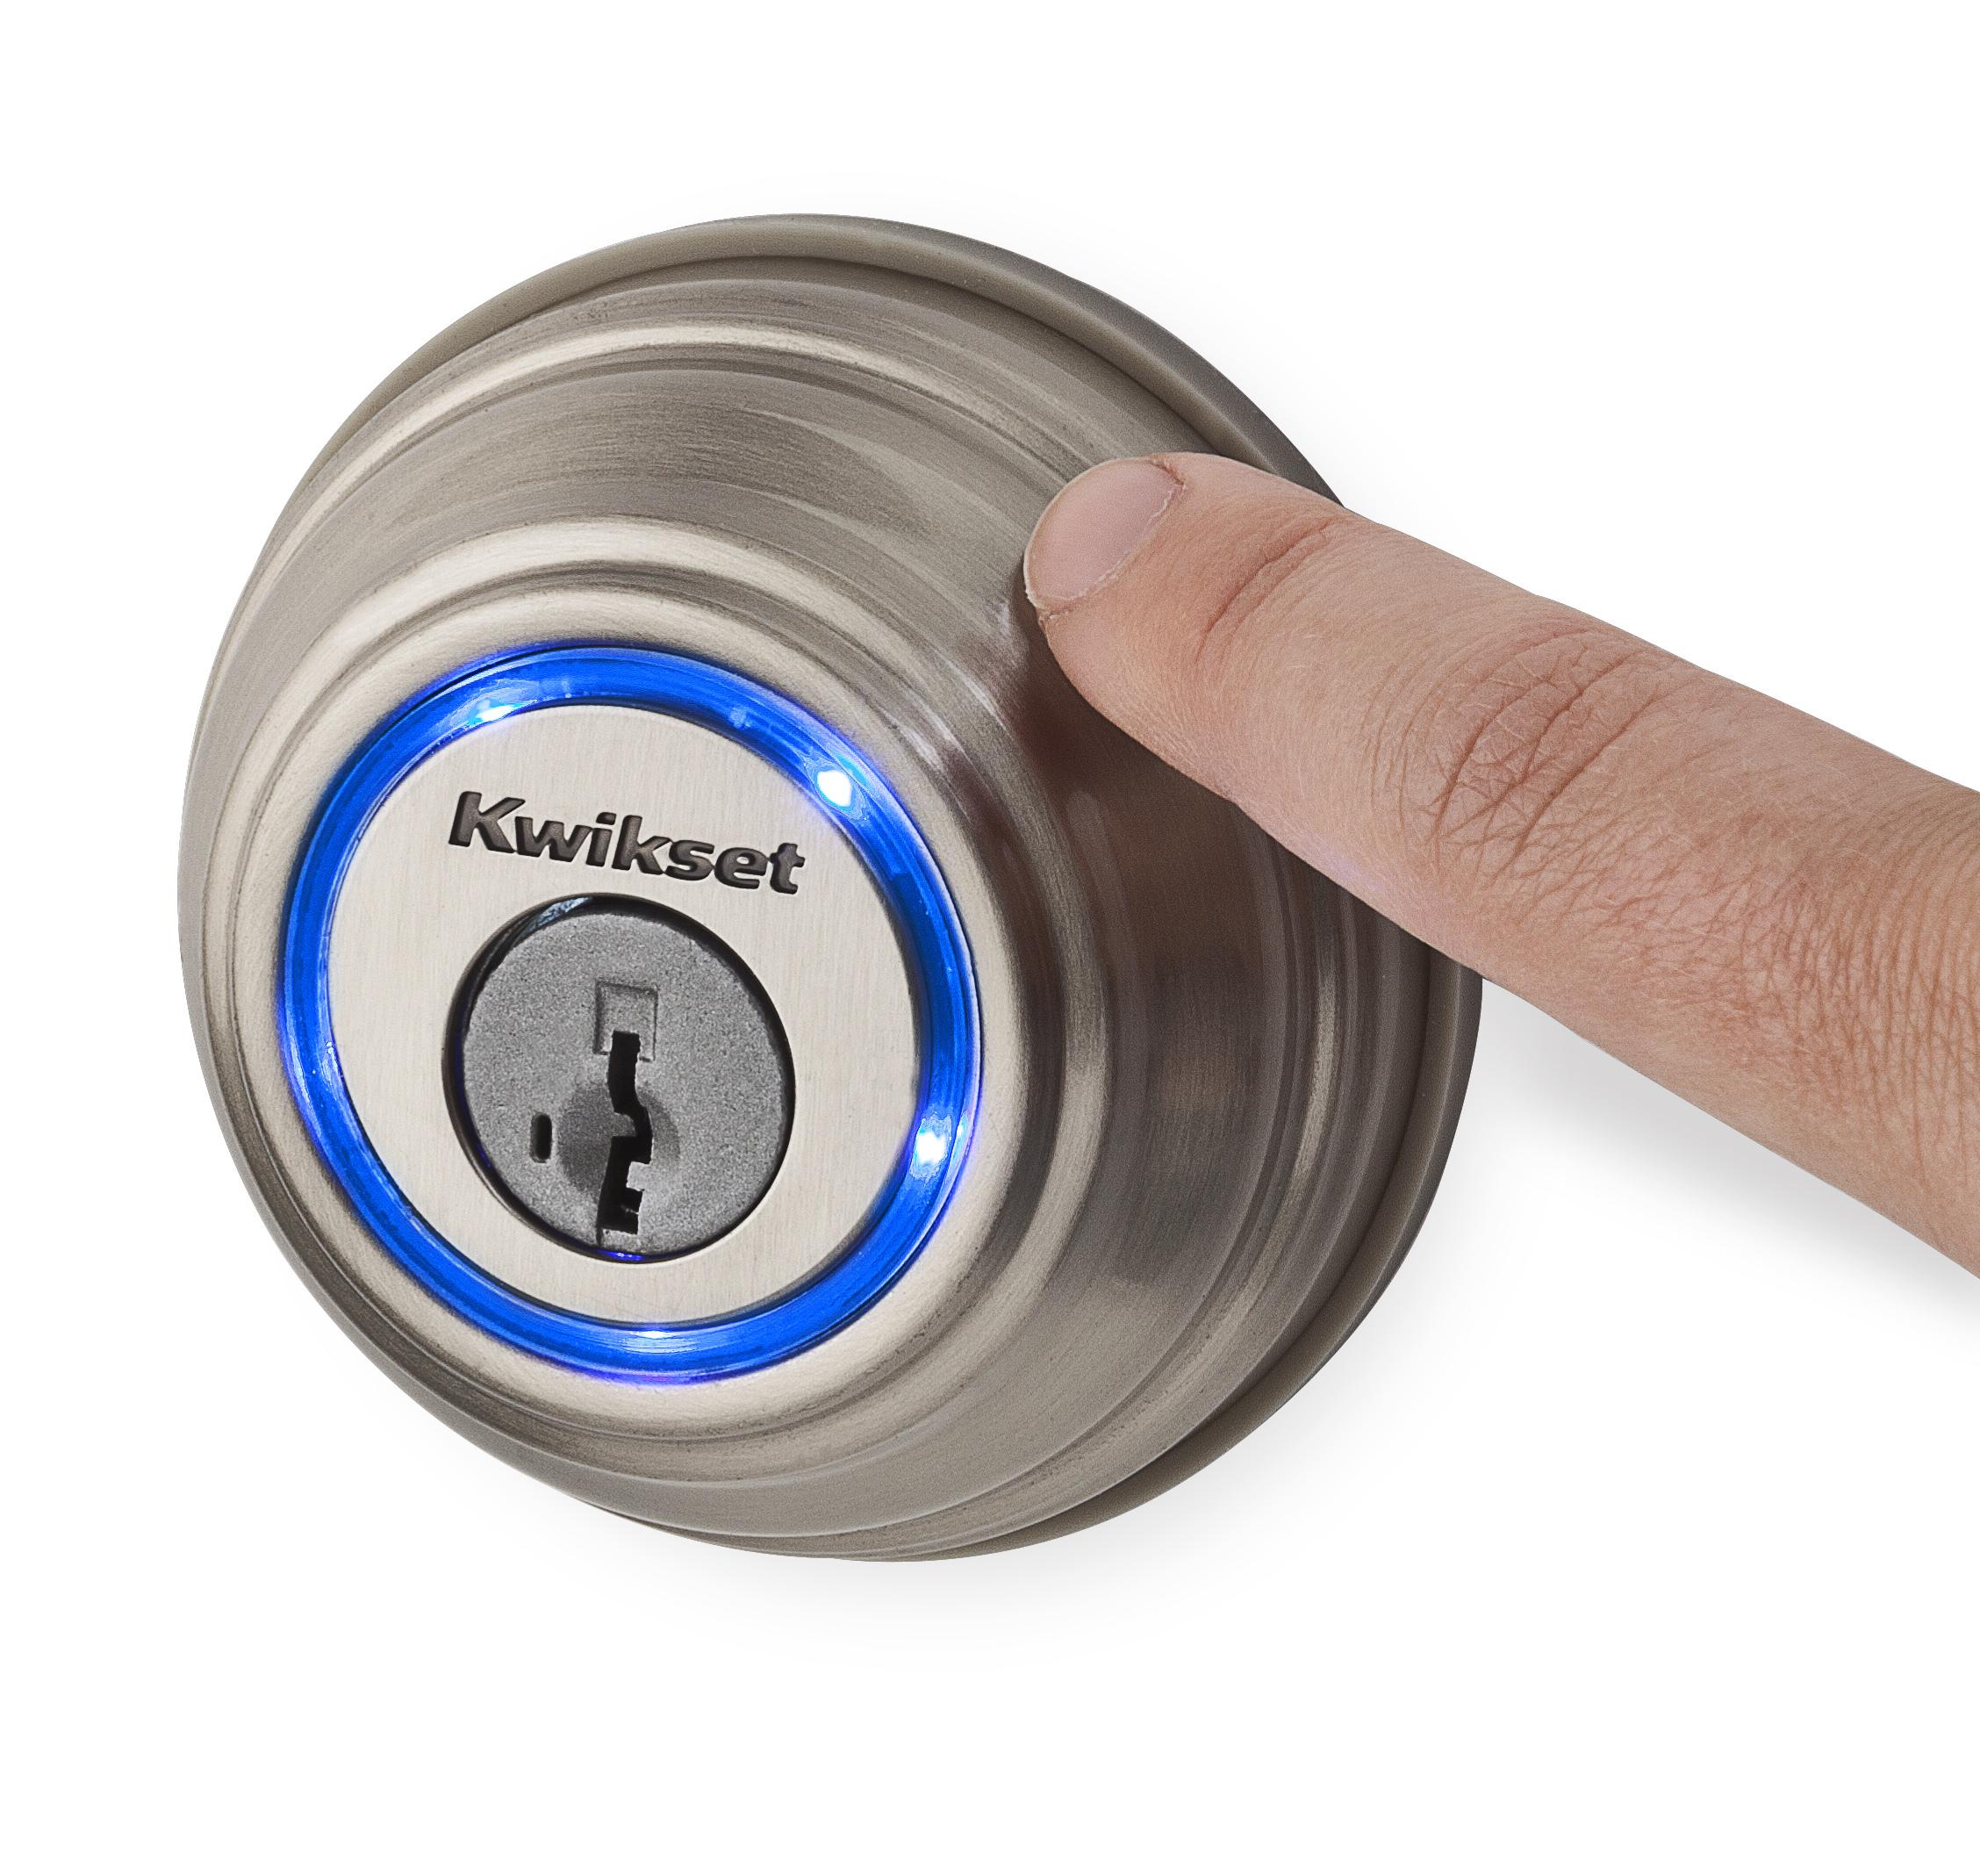 deadbolt doors list as door s aa kwikset htm angie keyless keylesslocks articles good a regular lock entry is